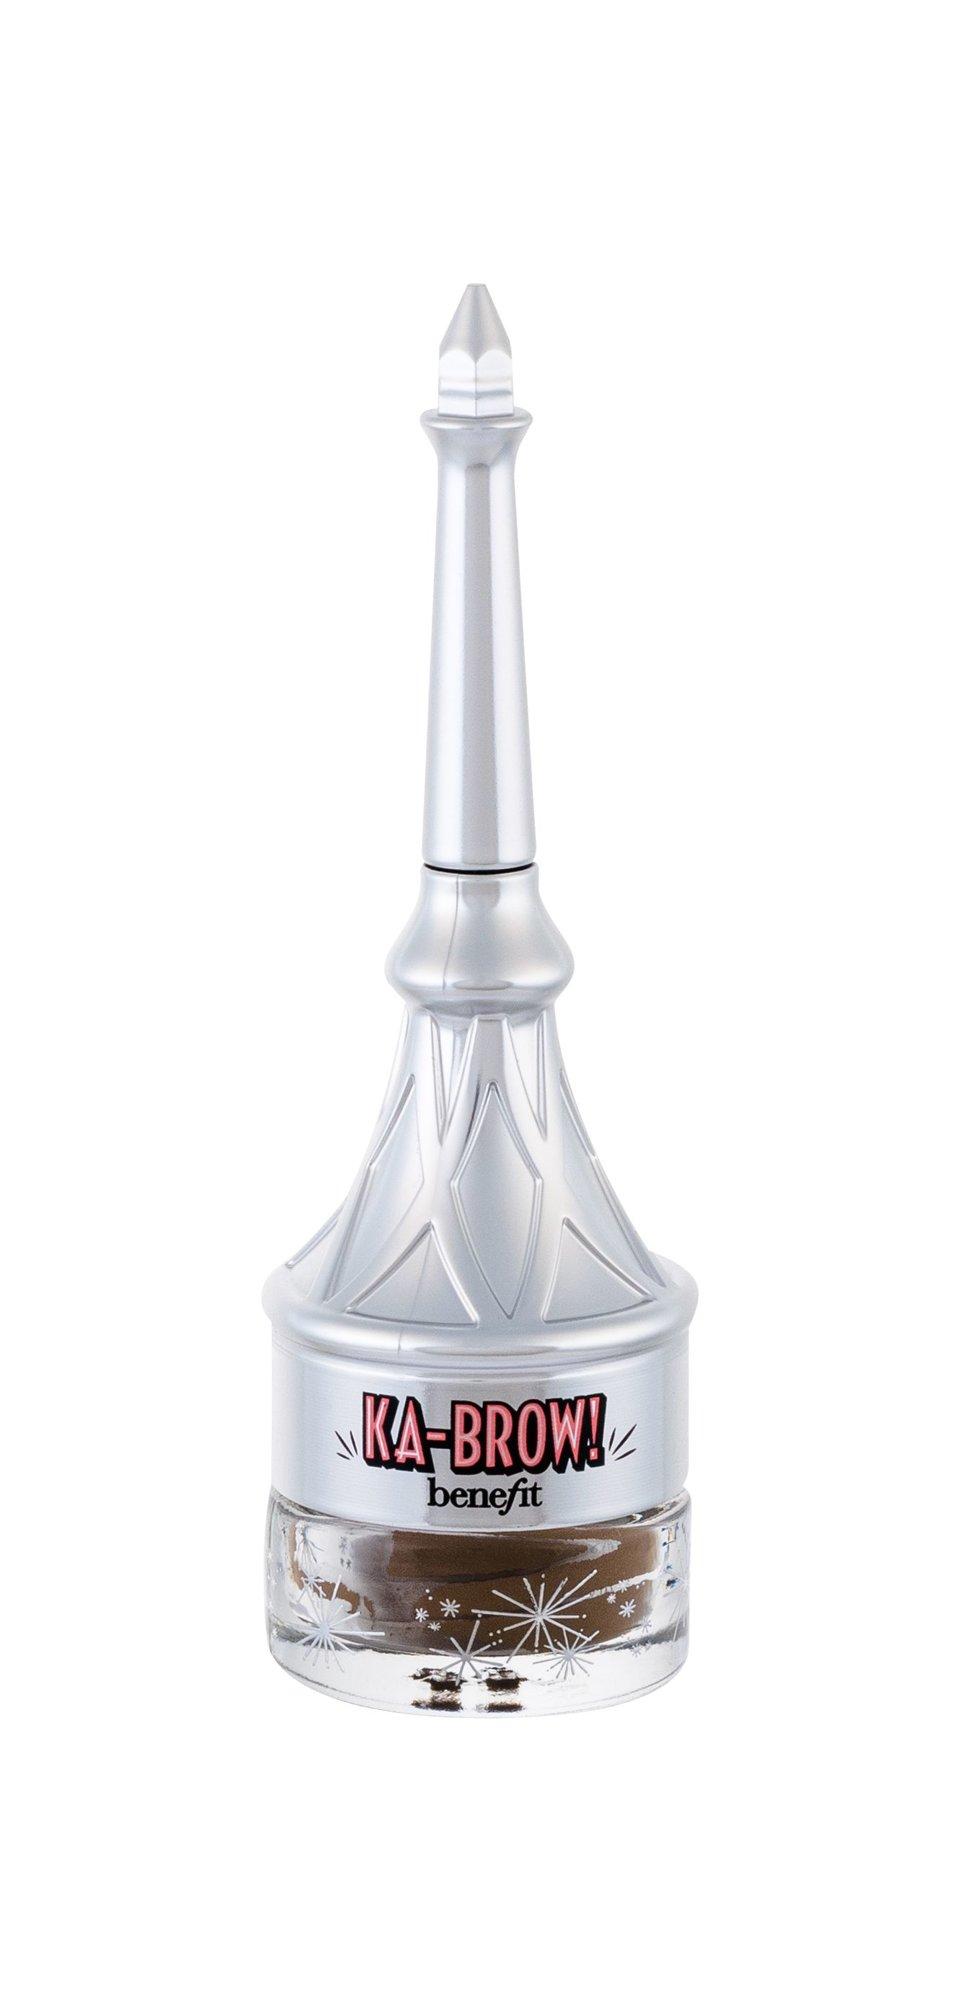 Benefit ka-Brow! Eyebrow Gel and Eyebrow Pomade 3ml 3.5 Neutral Medium Brown